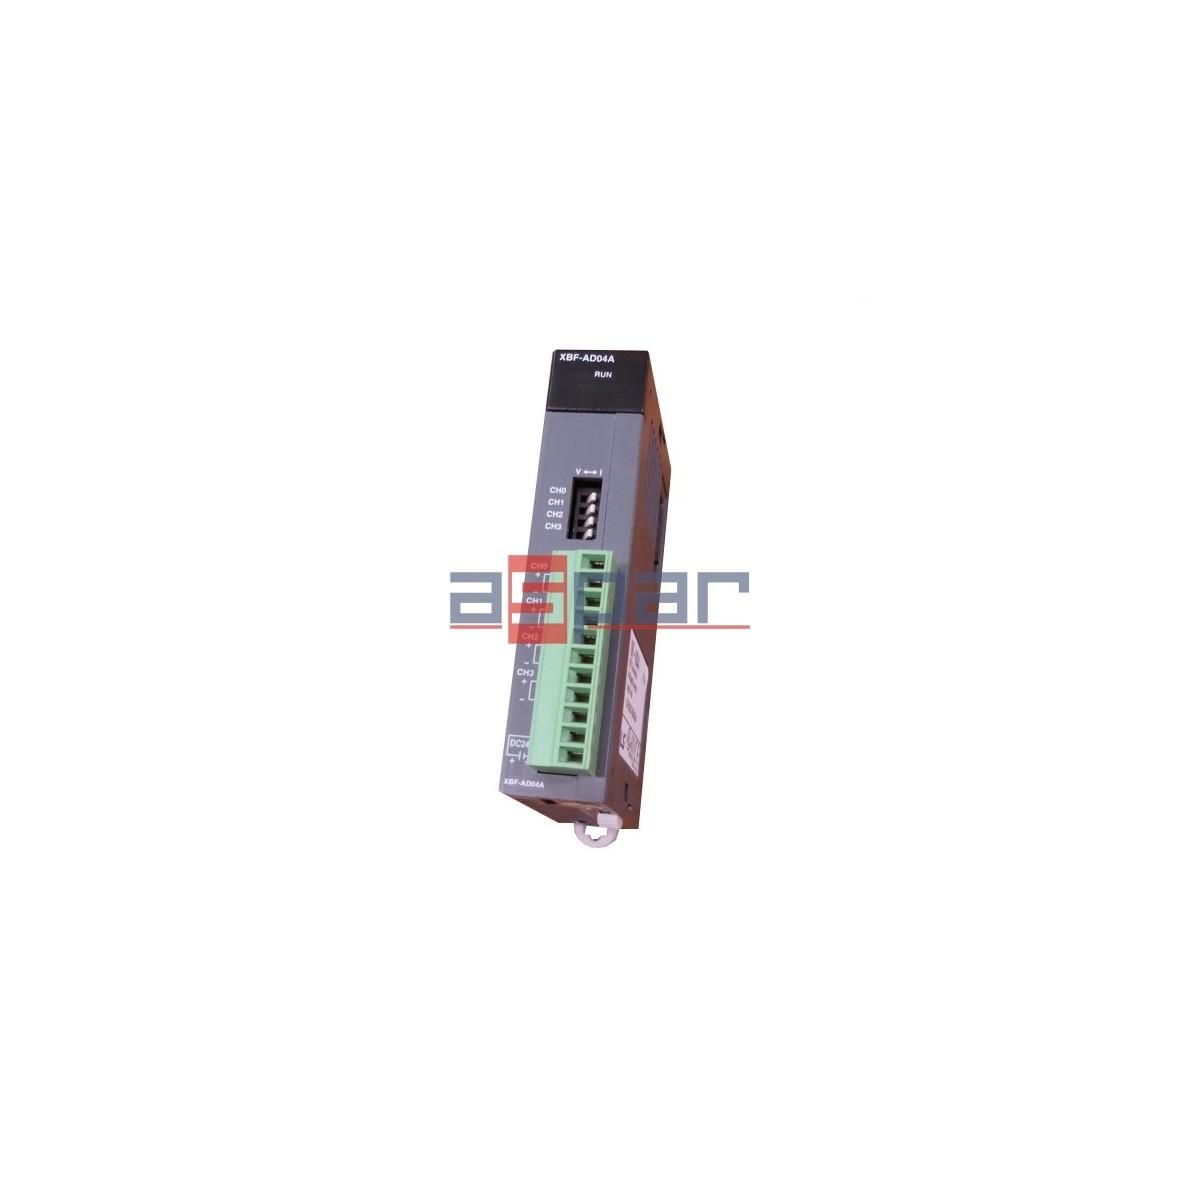 XBF-AD04A - 4 analogue inputs